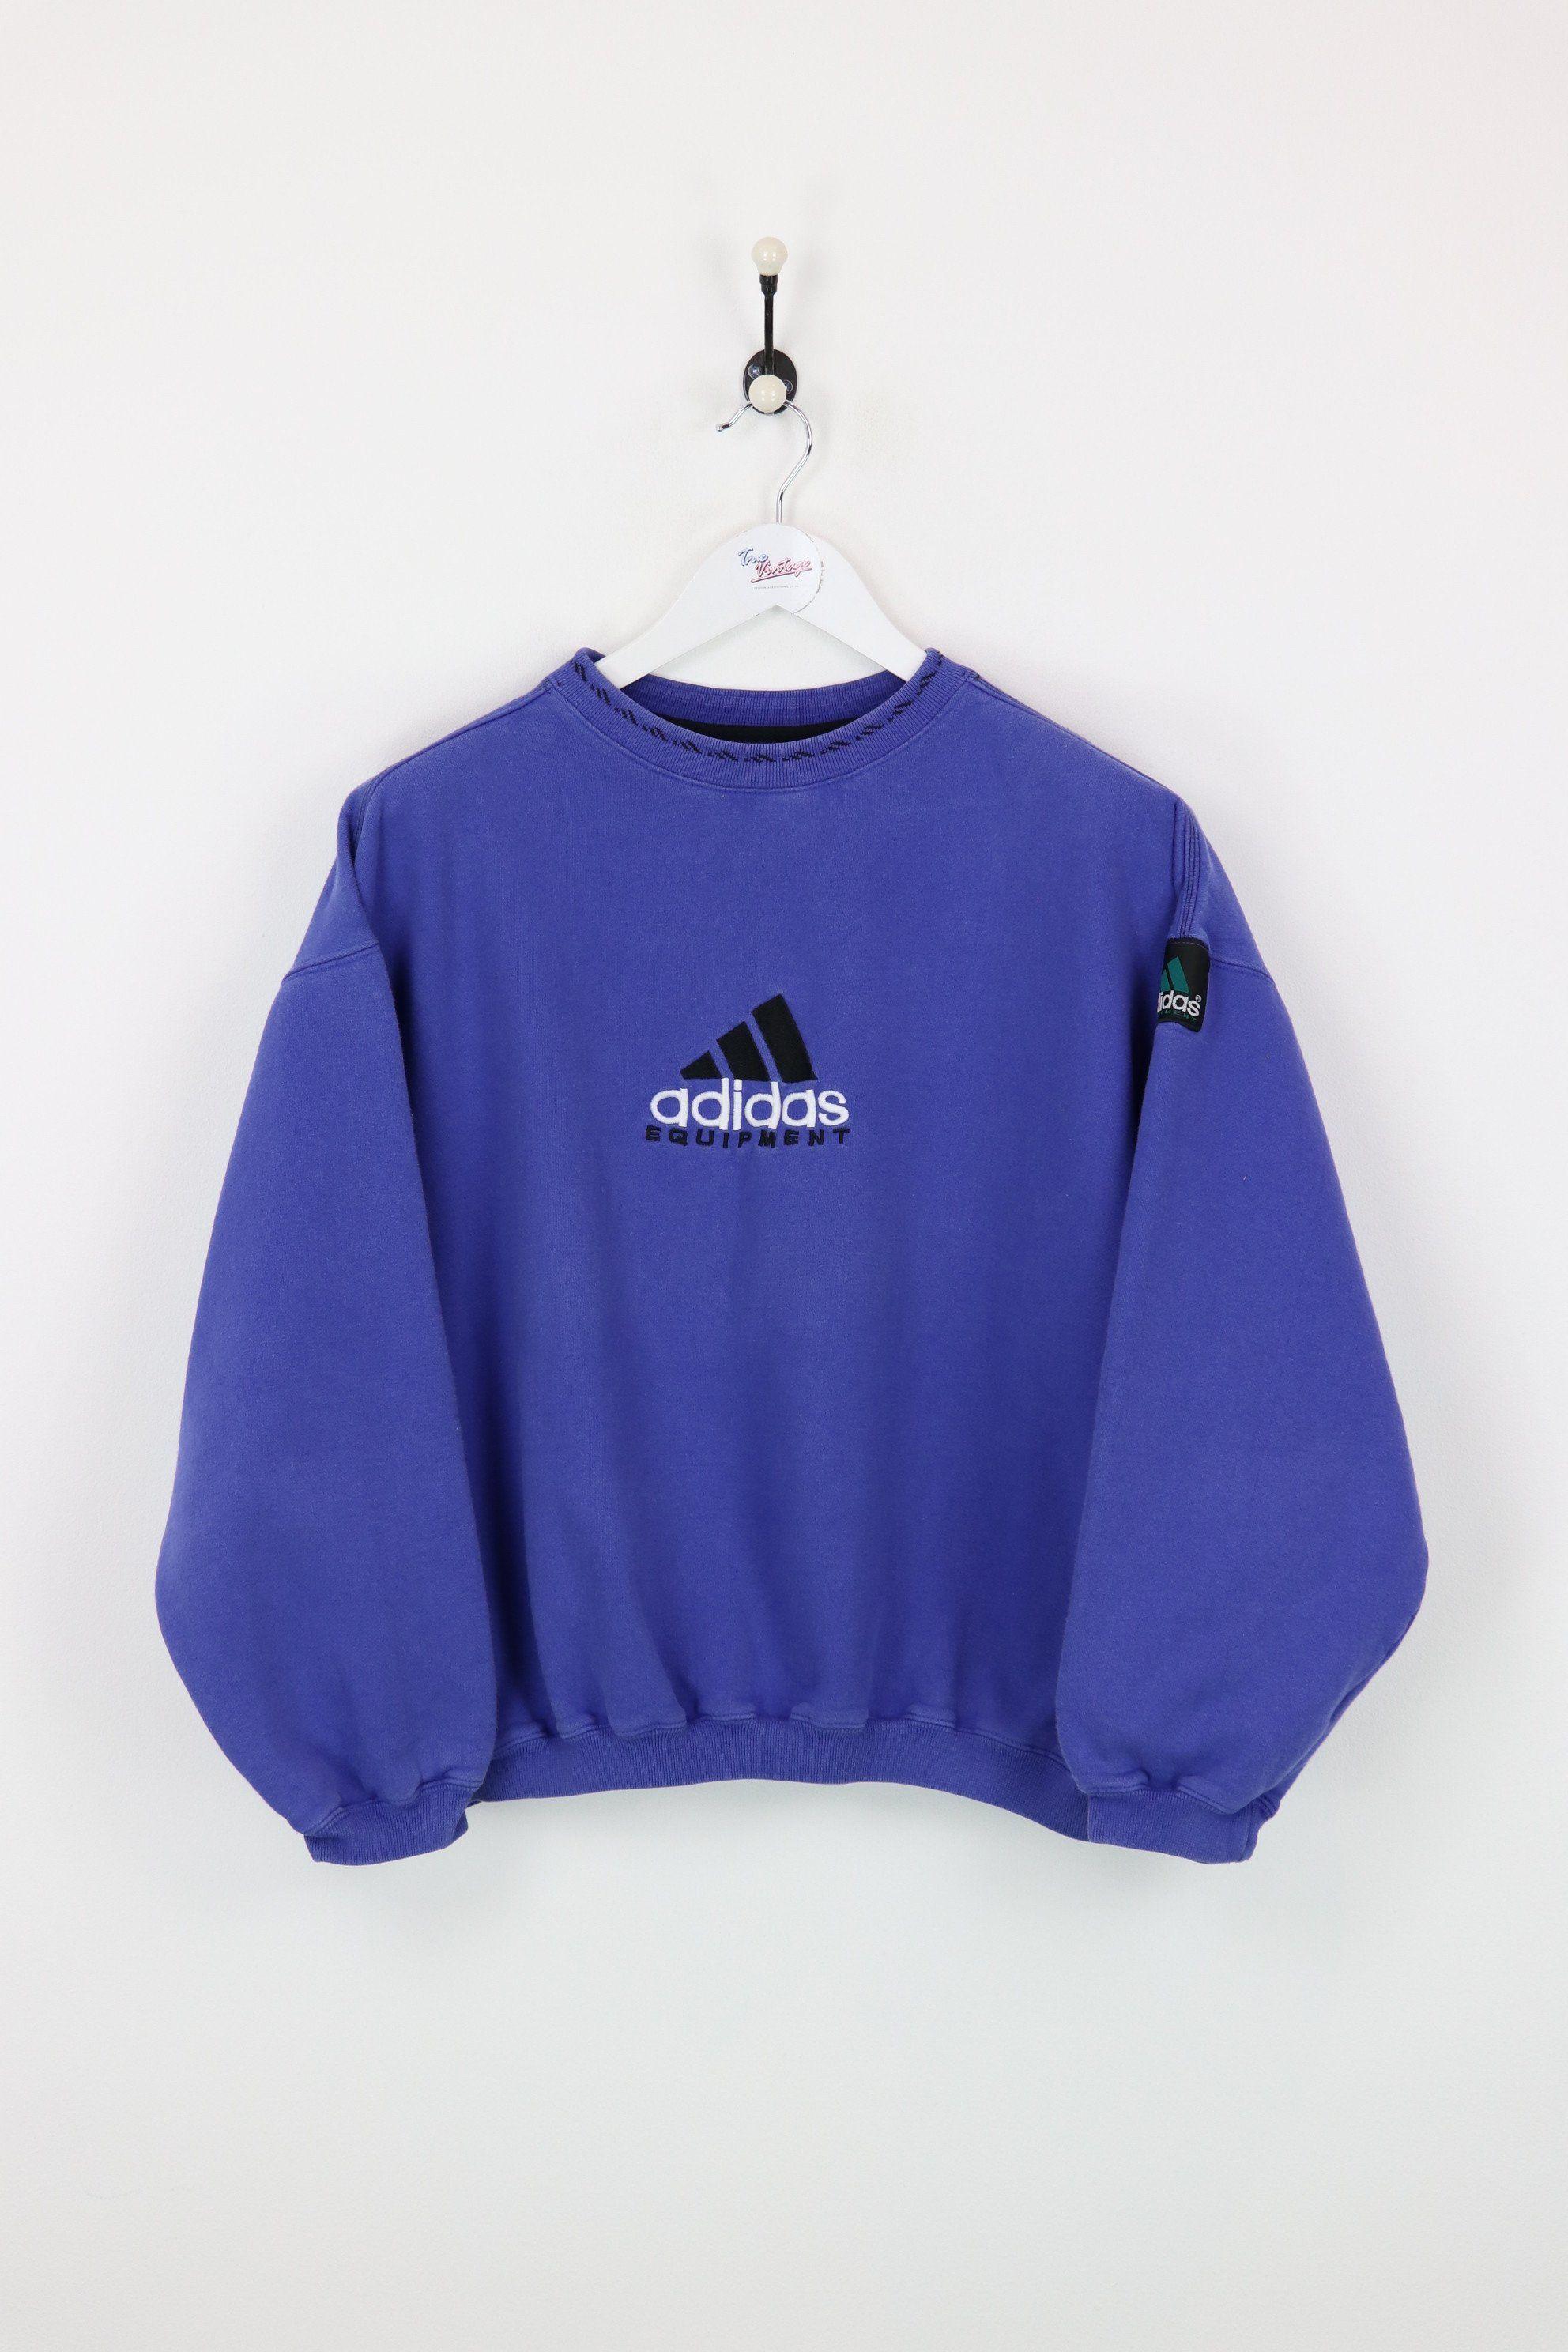 Adidas Equipment vintage Cropped sweatshirt white Depop